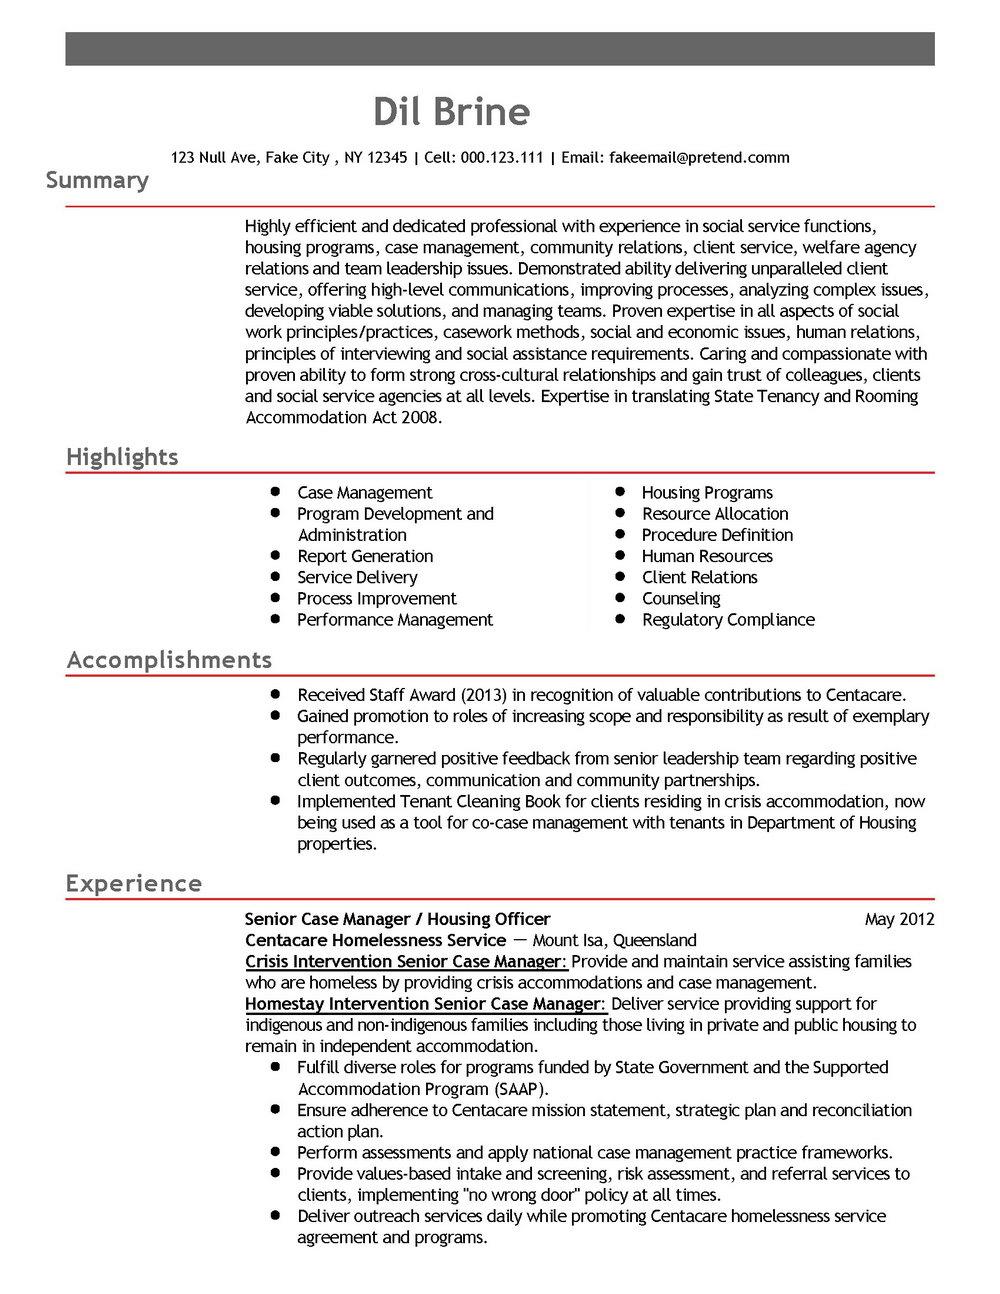 Resume Samples For Development Professionals